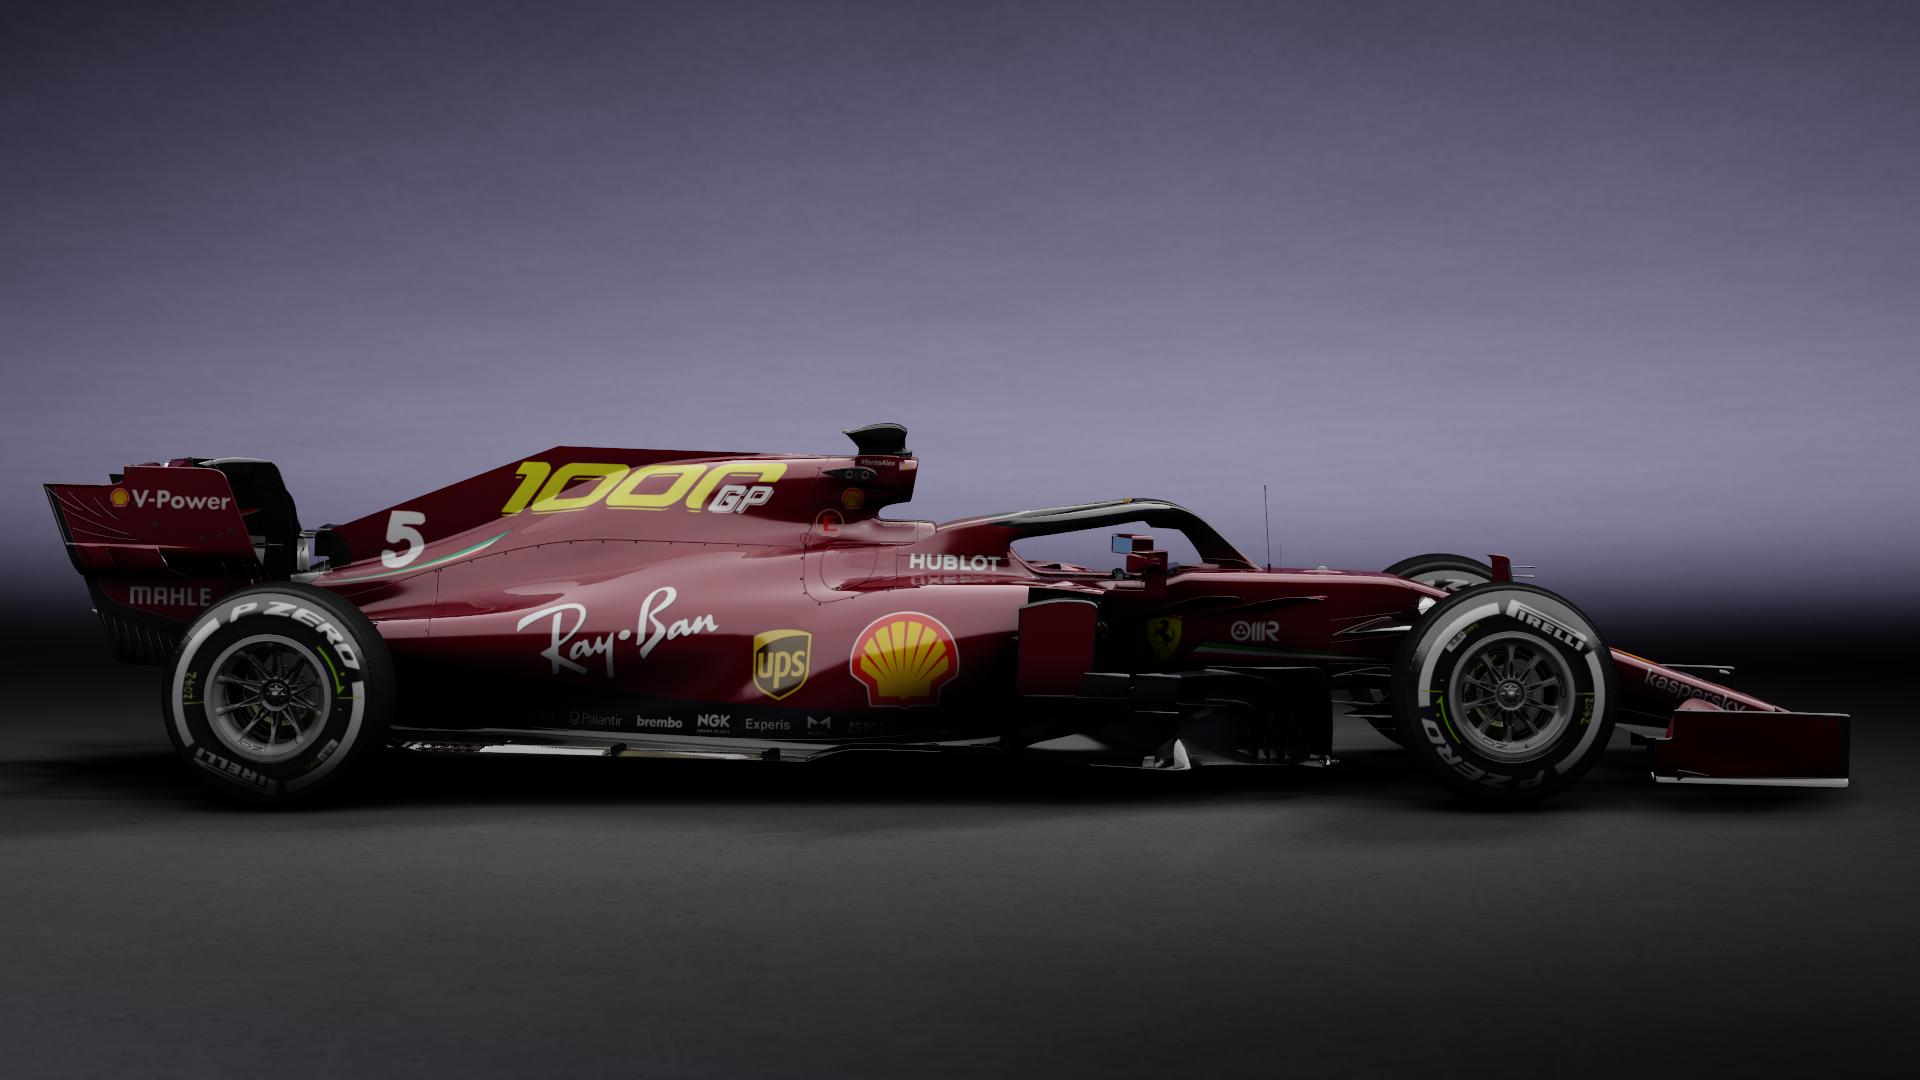 Formula Hybrid 2020 Sf1000 Mugello Skin Racedepartment